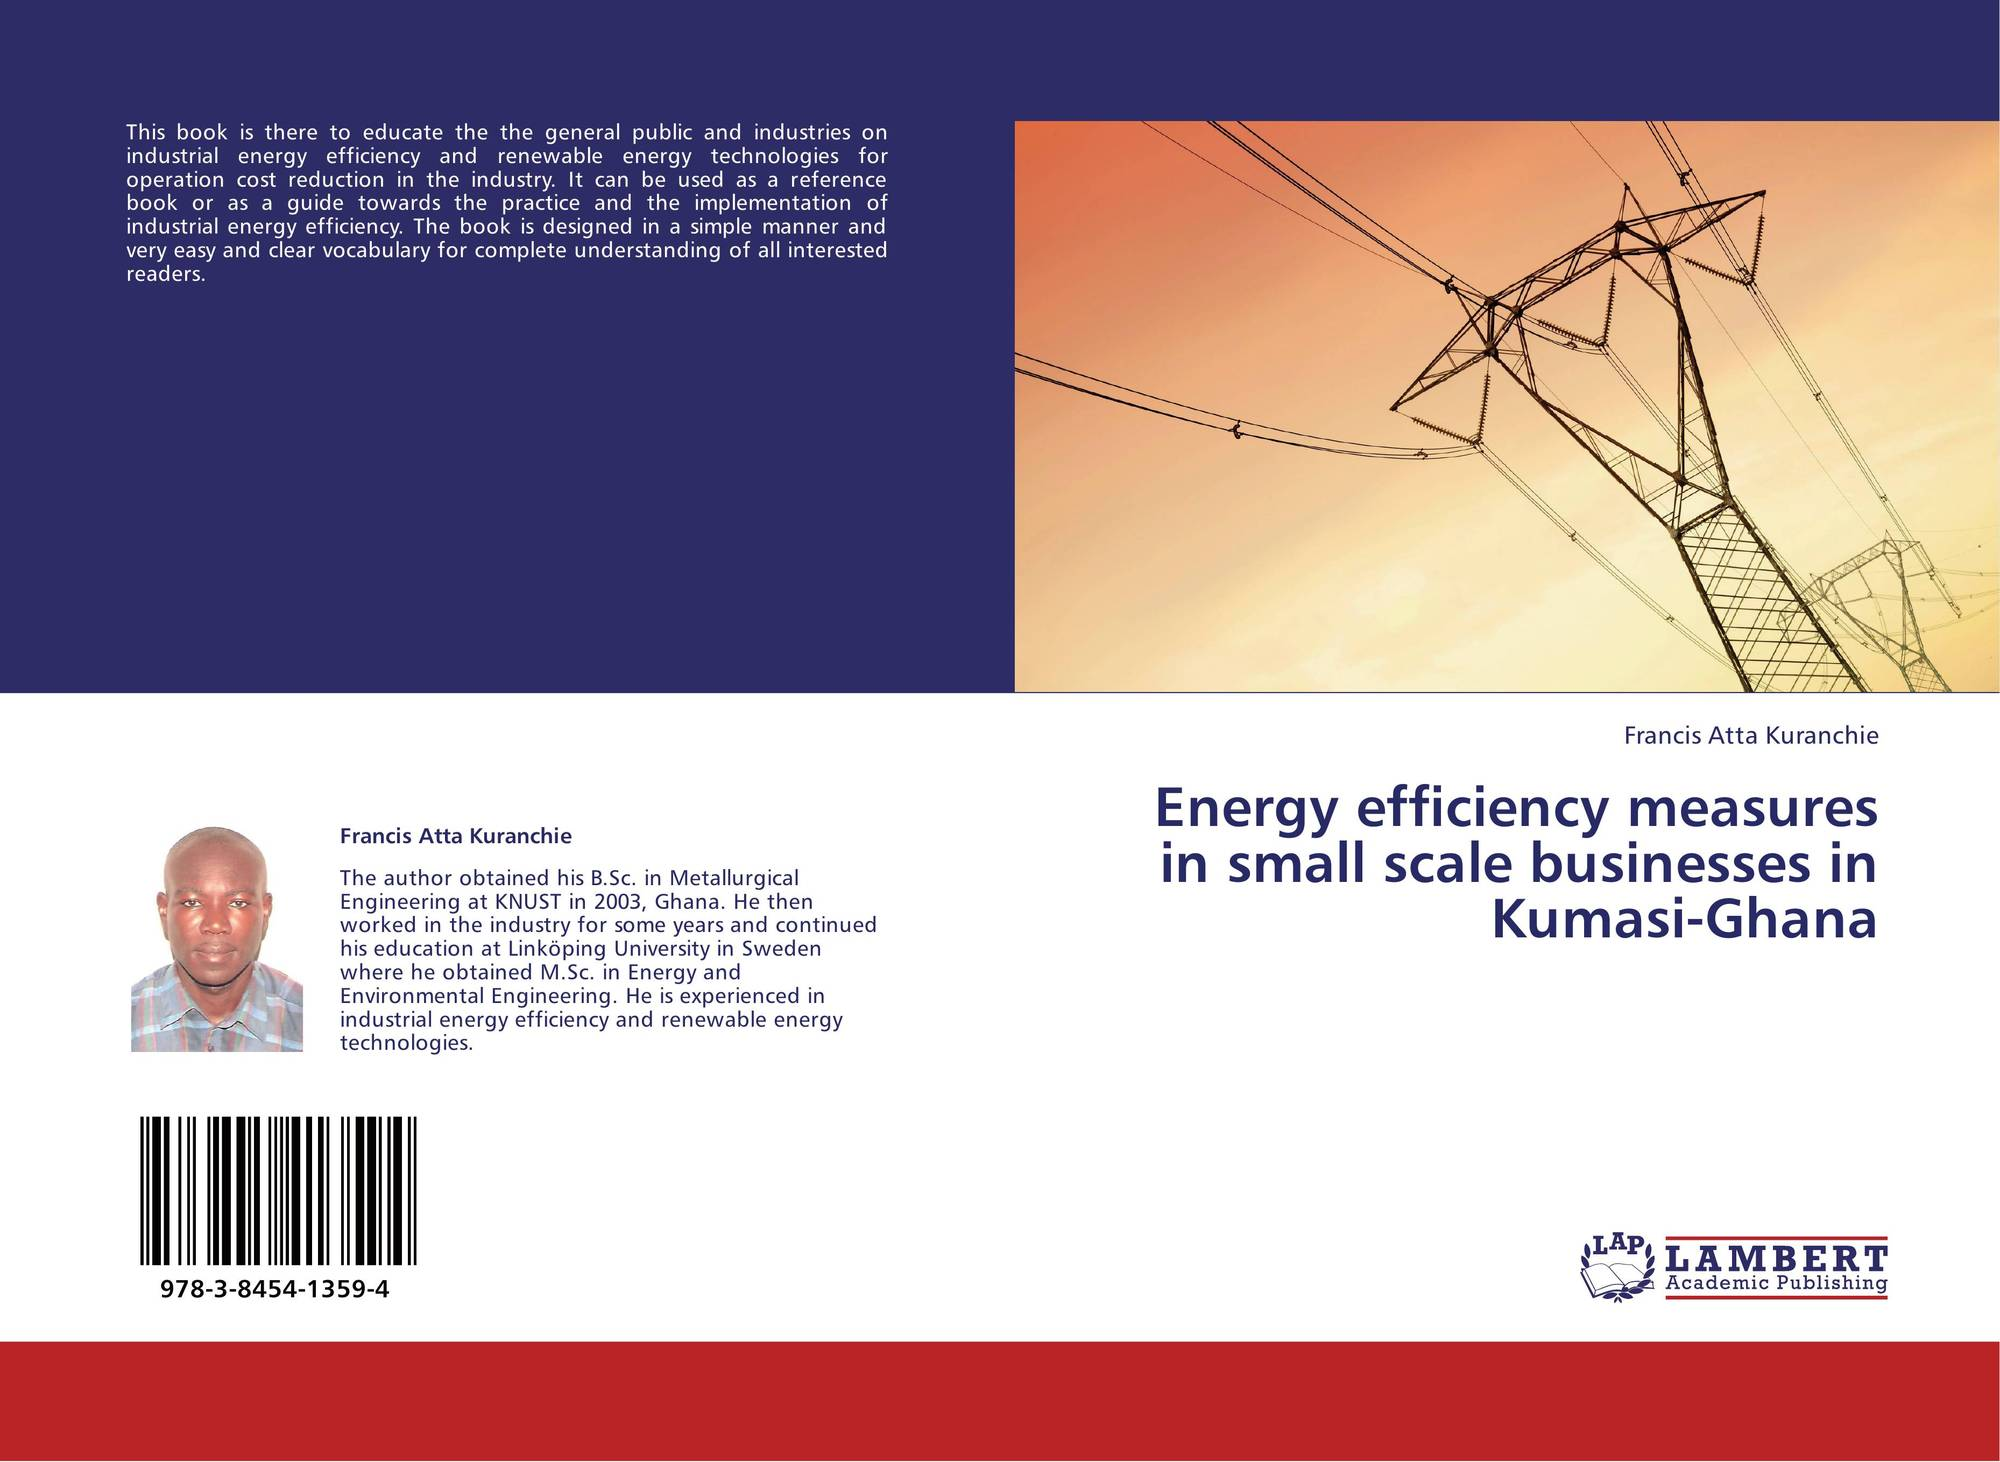 Energy efficiency measures in small scale businesses in Kumasi-Ghana